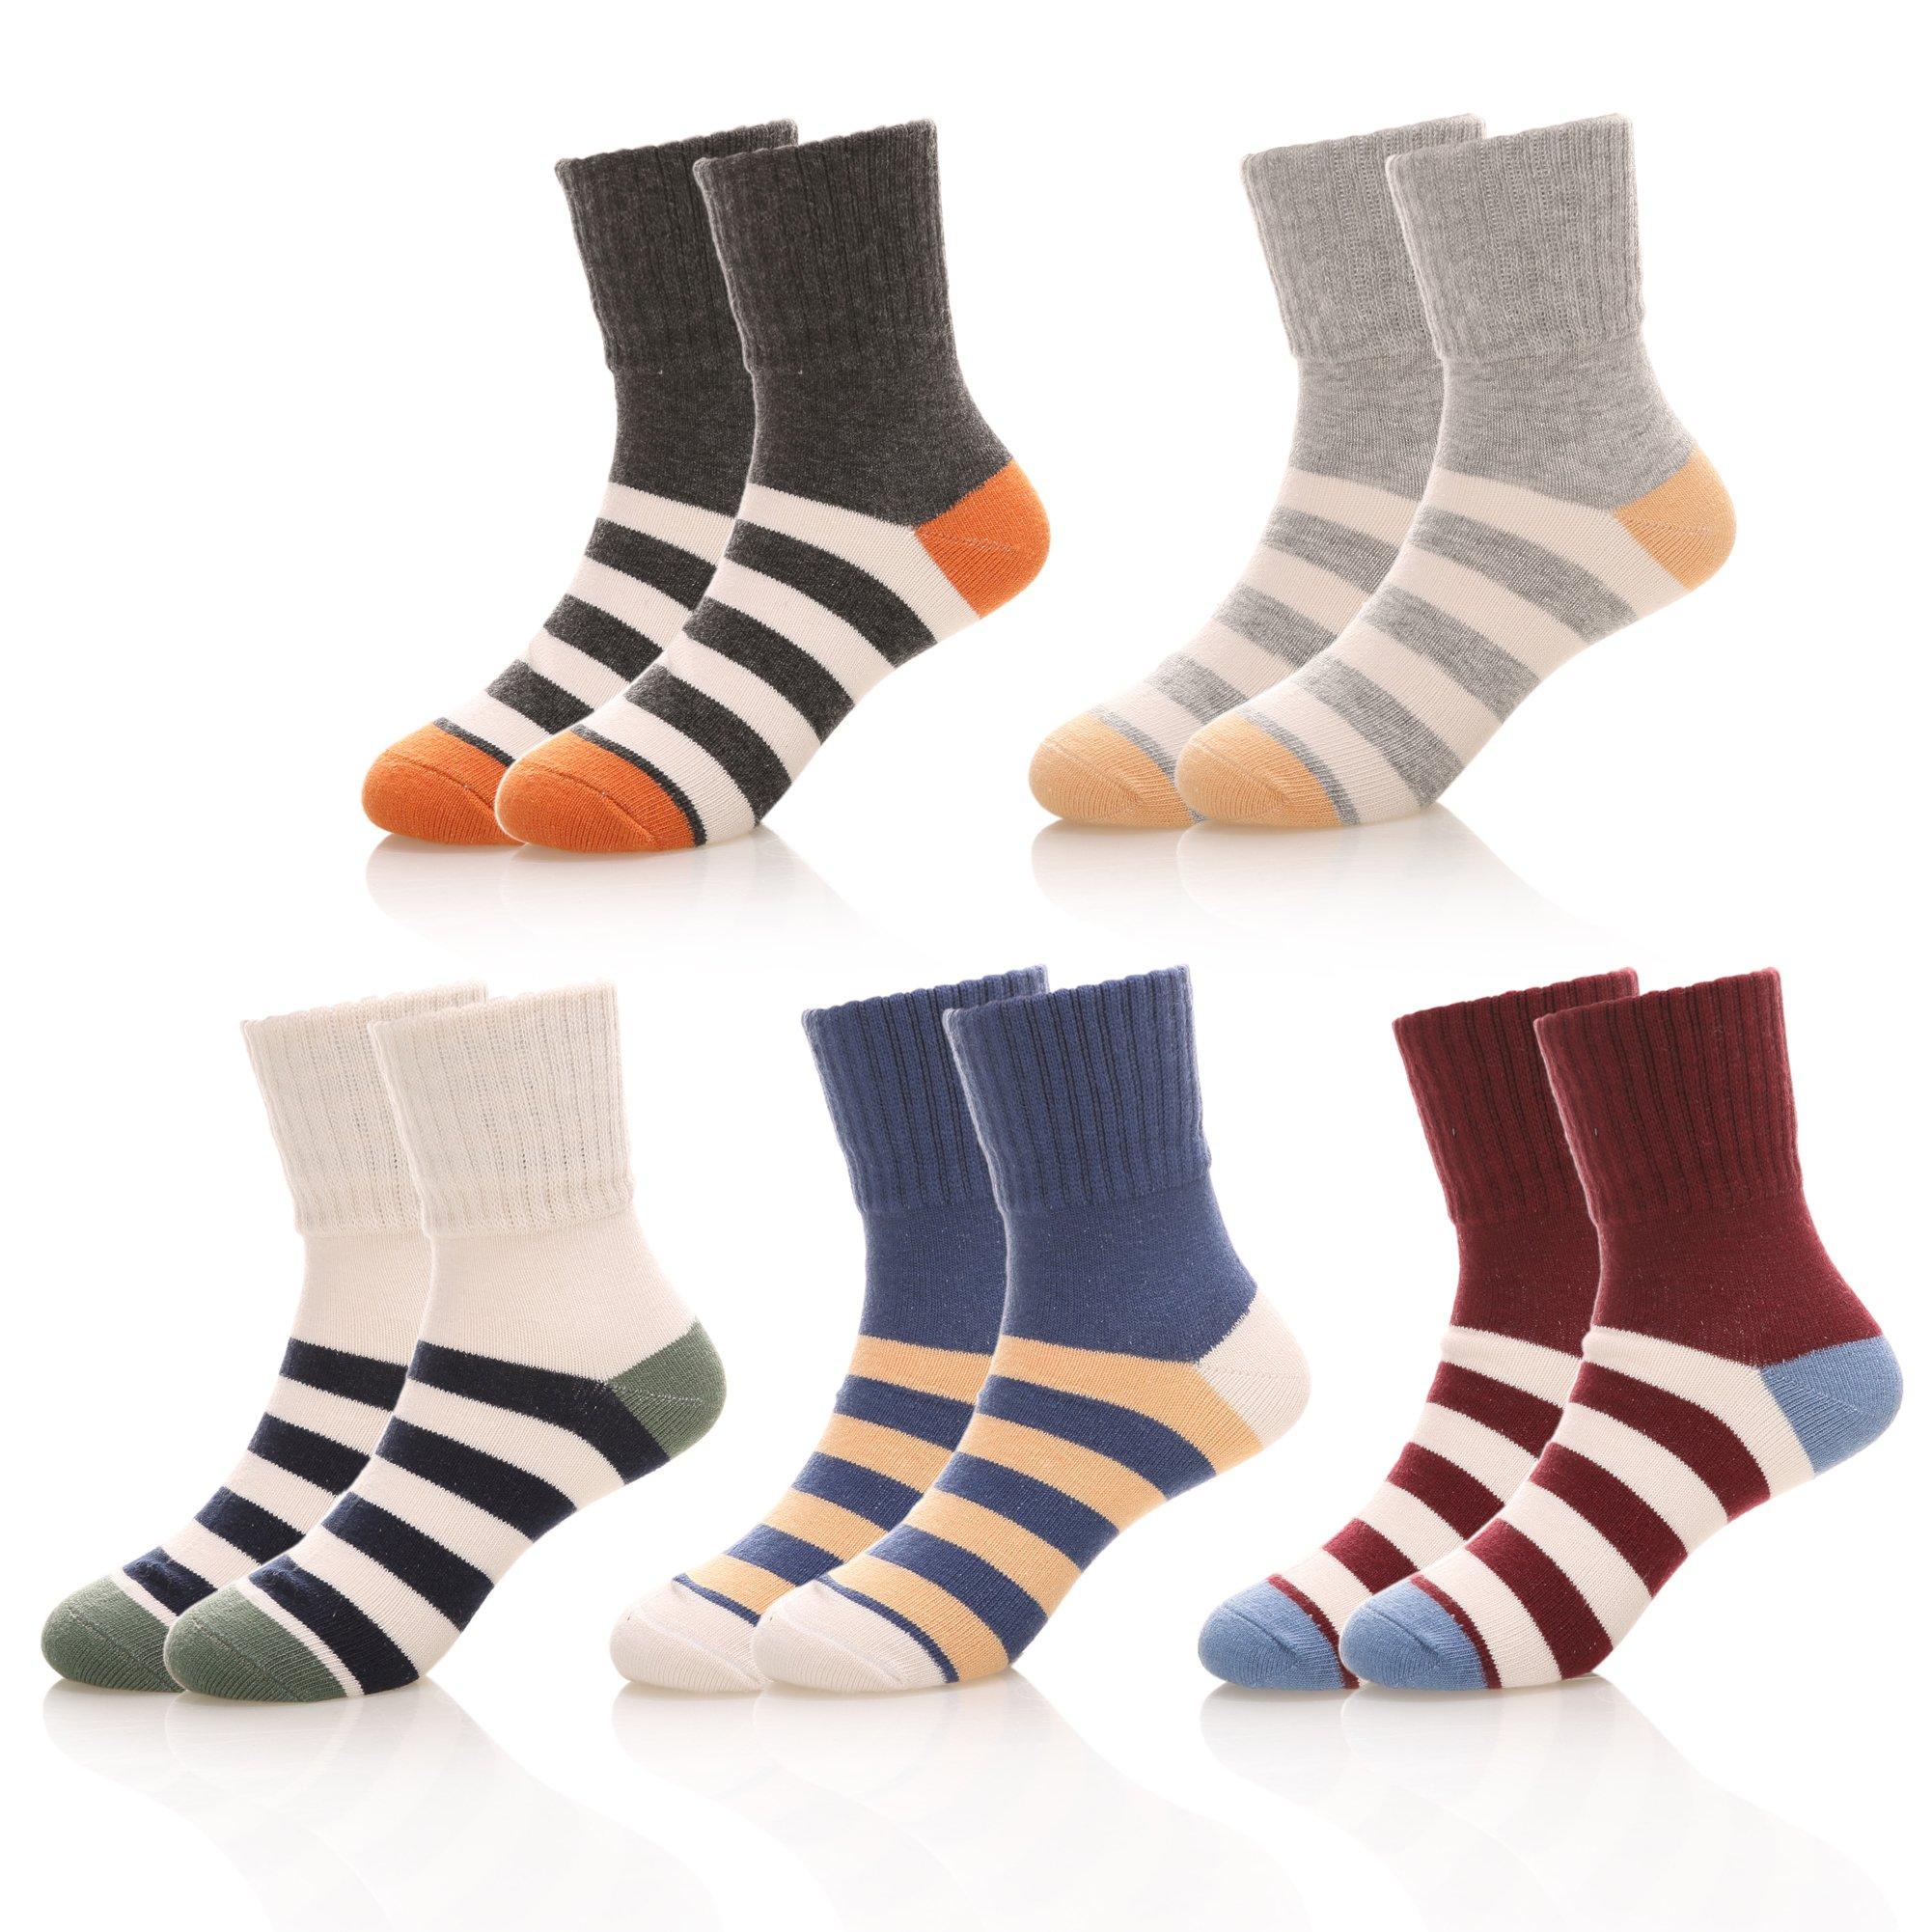 NOVCO Kids Little Boys Girls Colorful Stripes Cotton Athletic Socks 5 Pairs (Stripe 1, 3-5 Years)